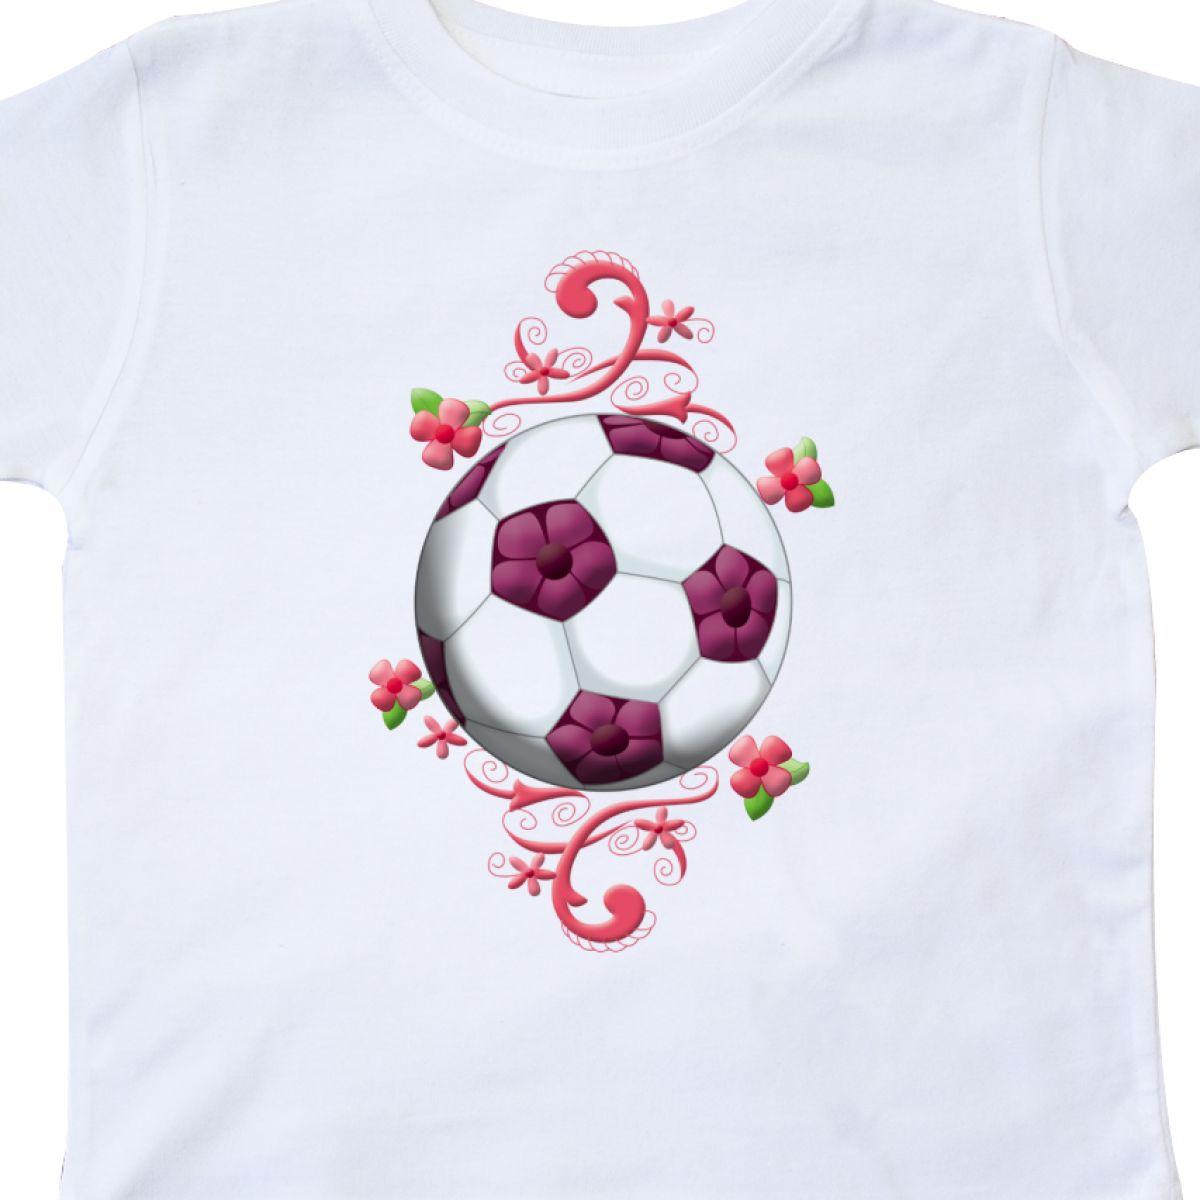 Inktastic Girl s Soccer Toddler T-Shirt Girl Futbol Goal Cleats Tees ... 361dcdd5b